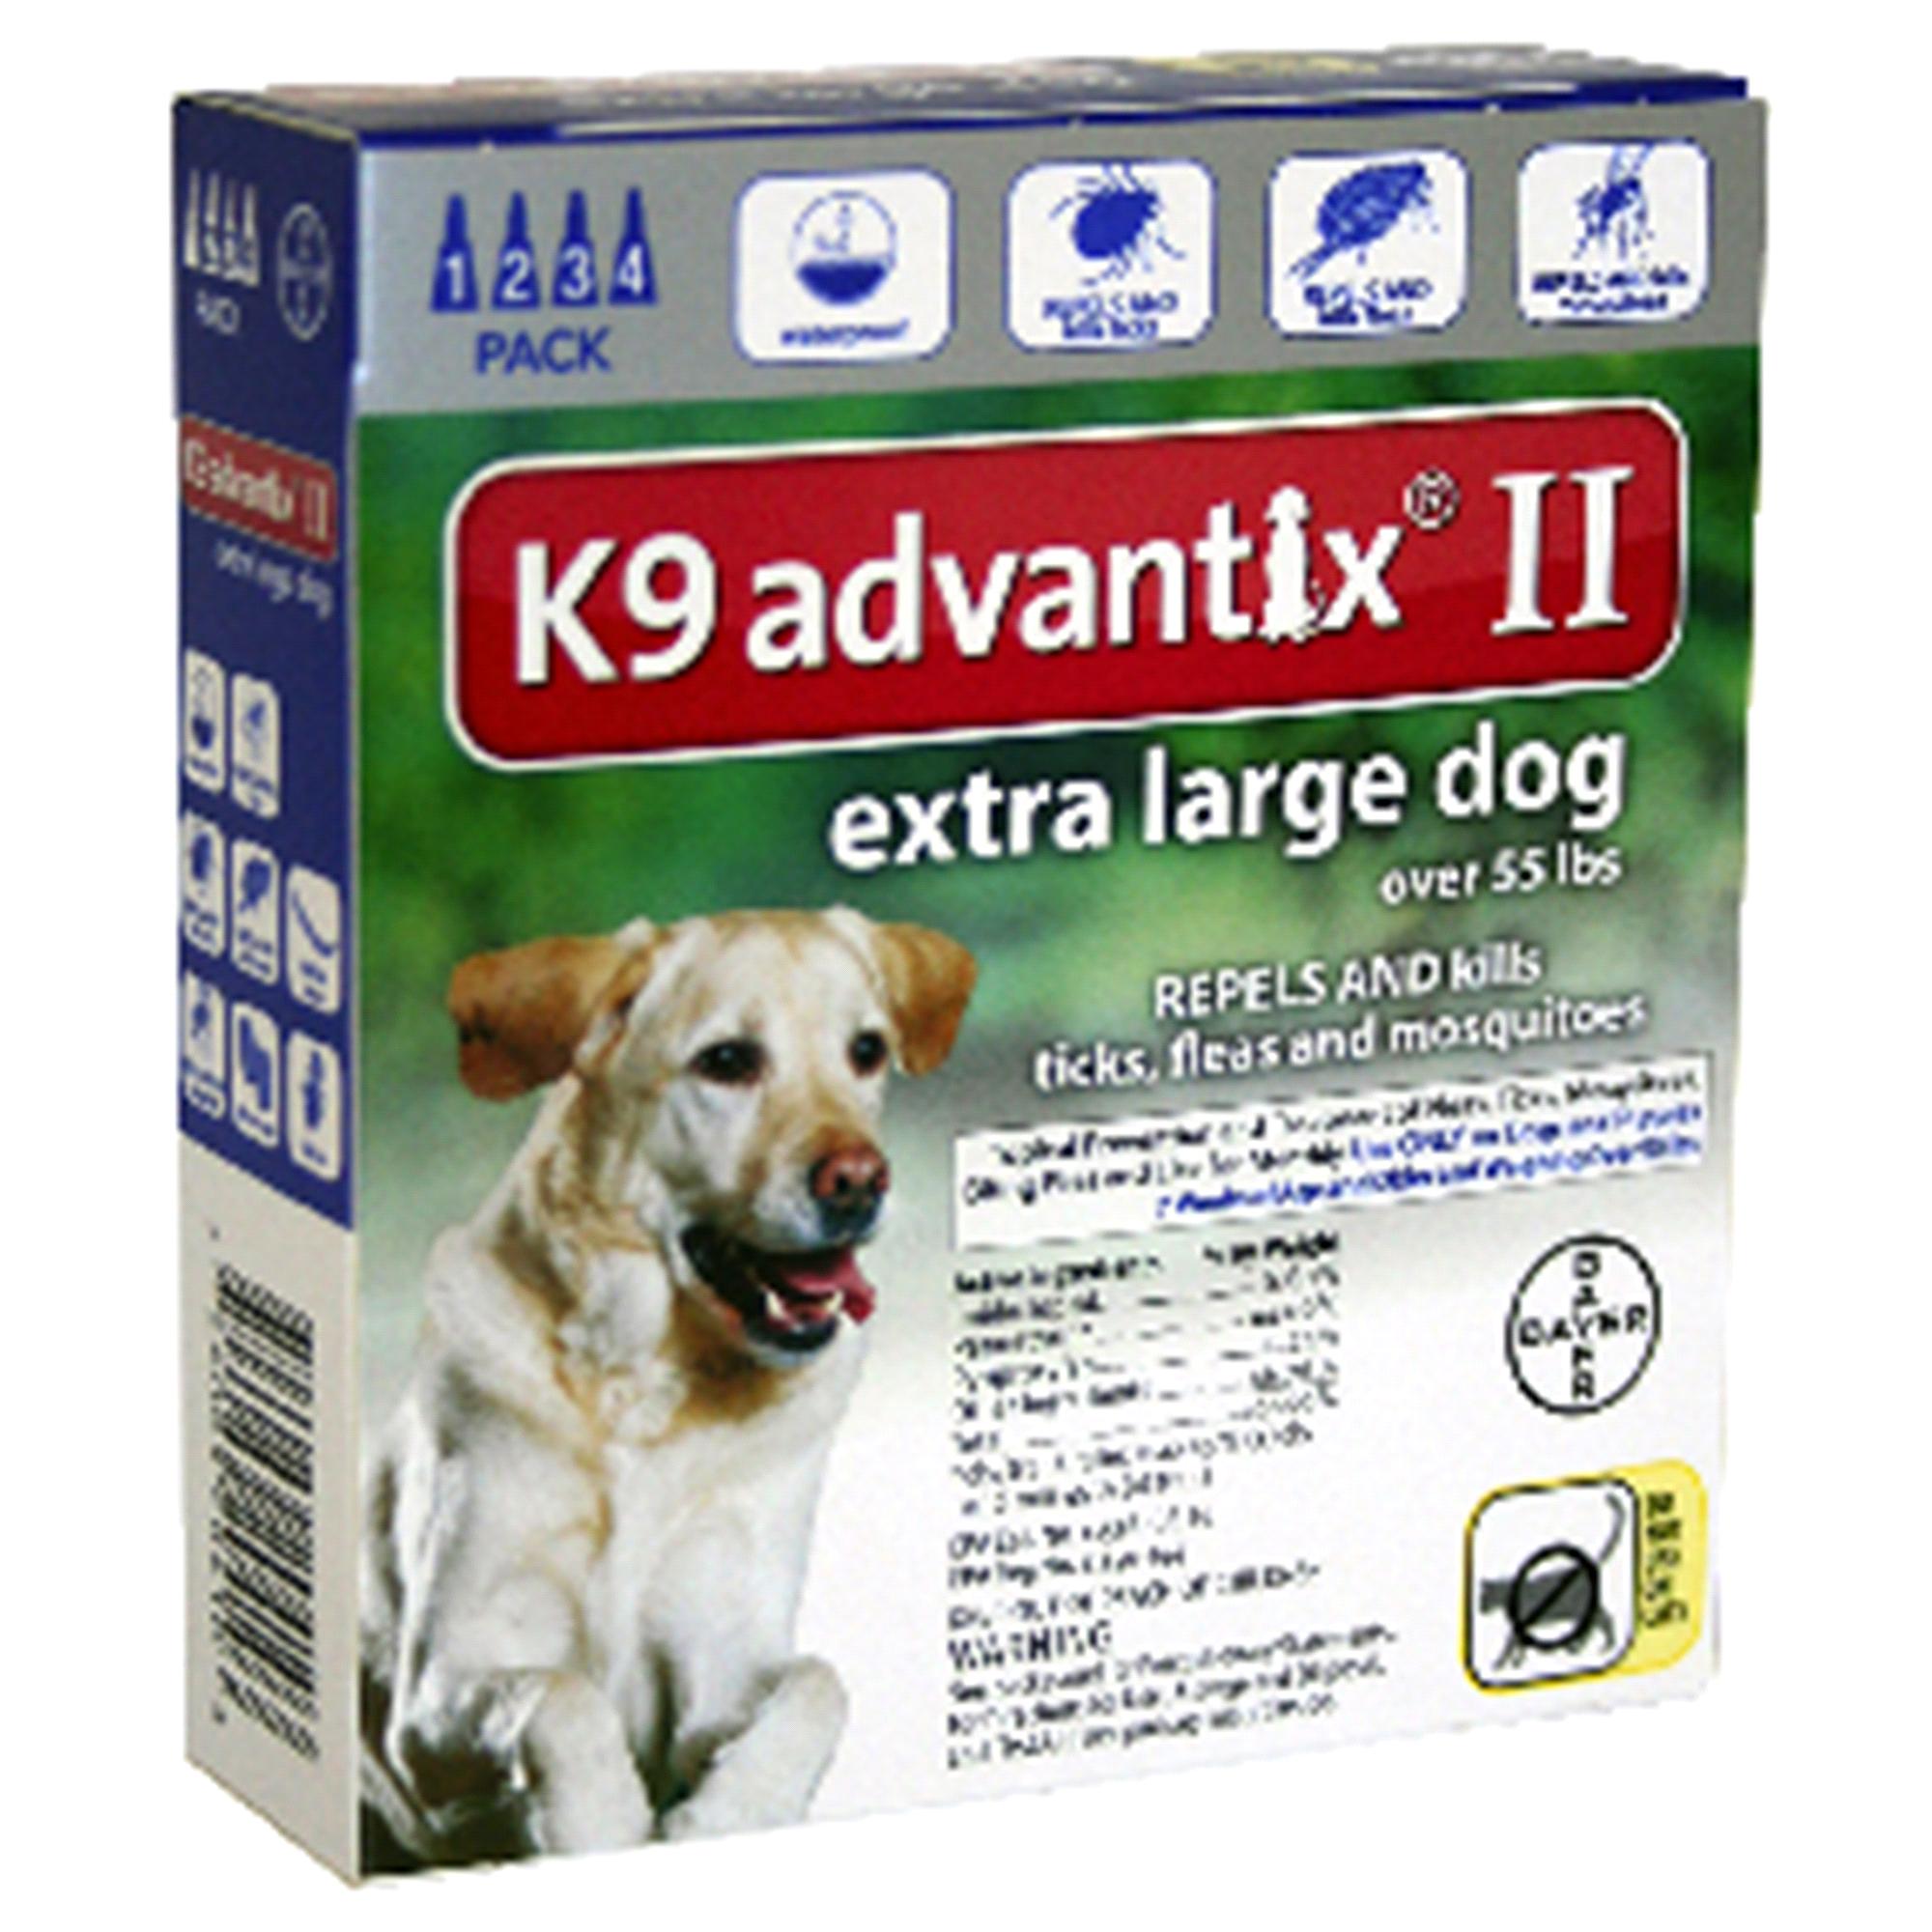 K 9 Advantix II Flea Tick Drops For Dogs 55 Lbs Or More 4 Pk